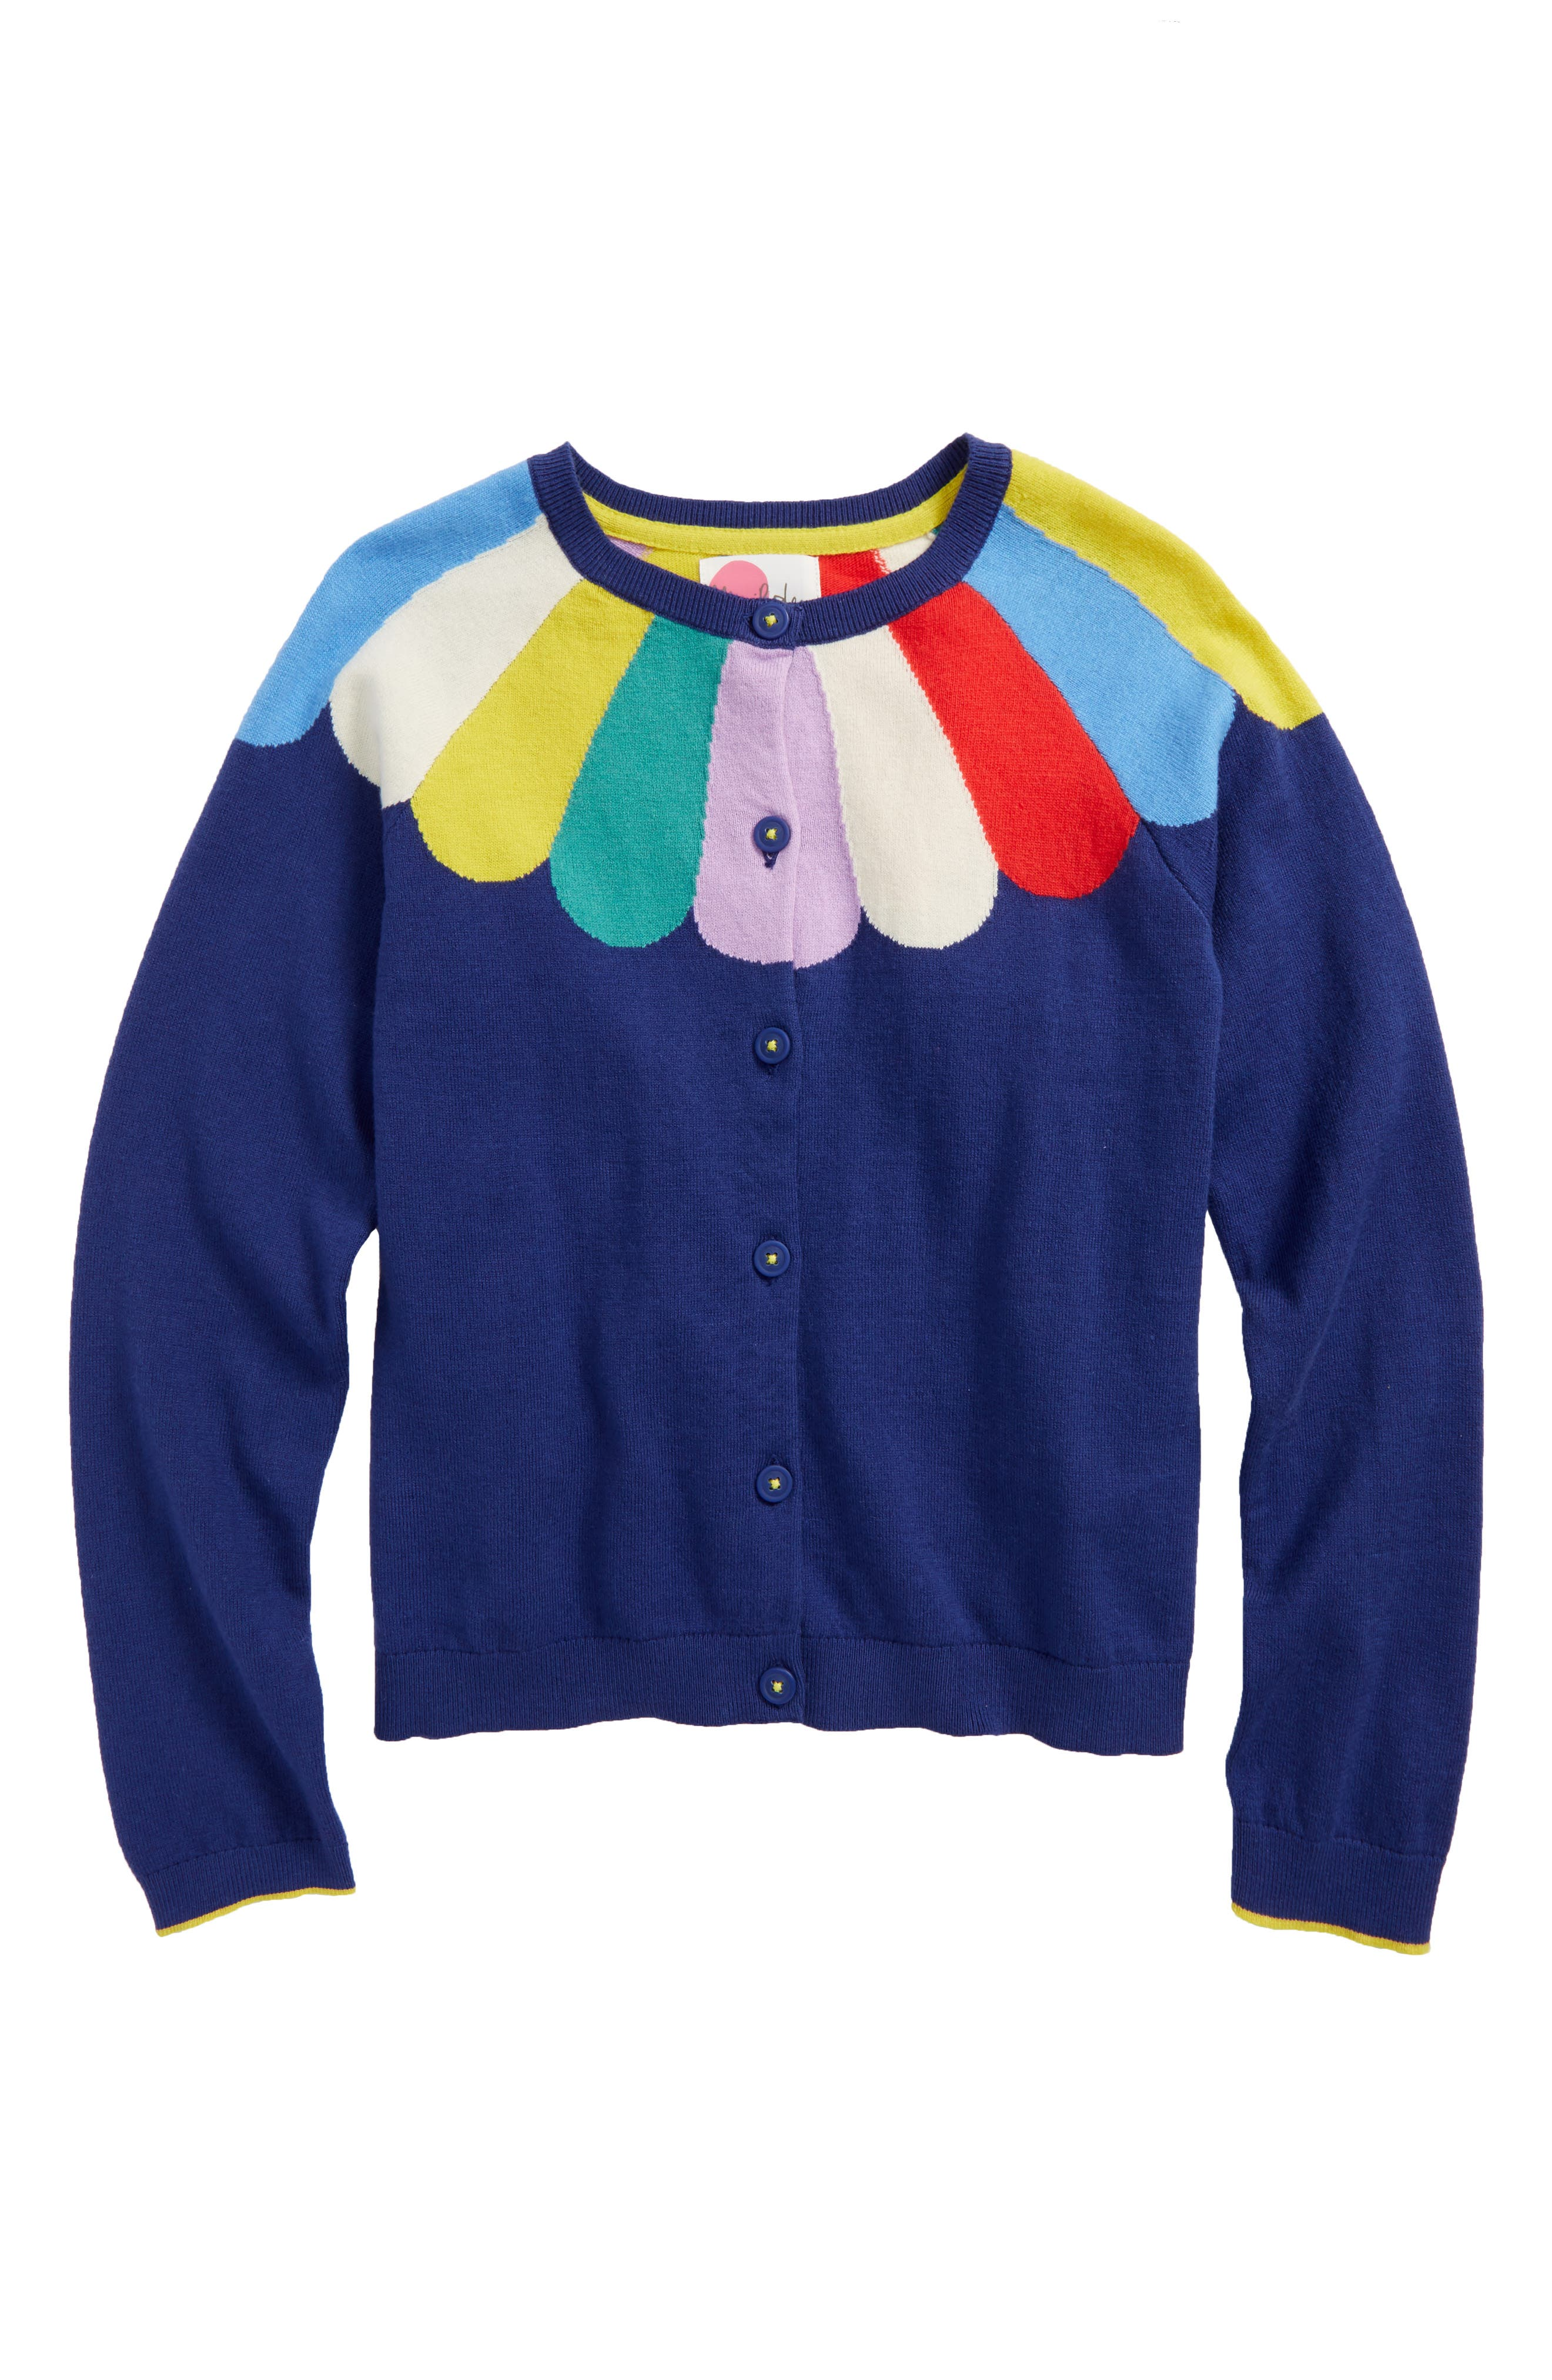 Fun Cardigan,                             Main thumbnail 1, color,                             Starboard/Rainbow Yoke